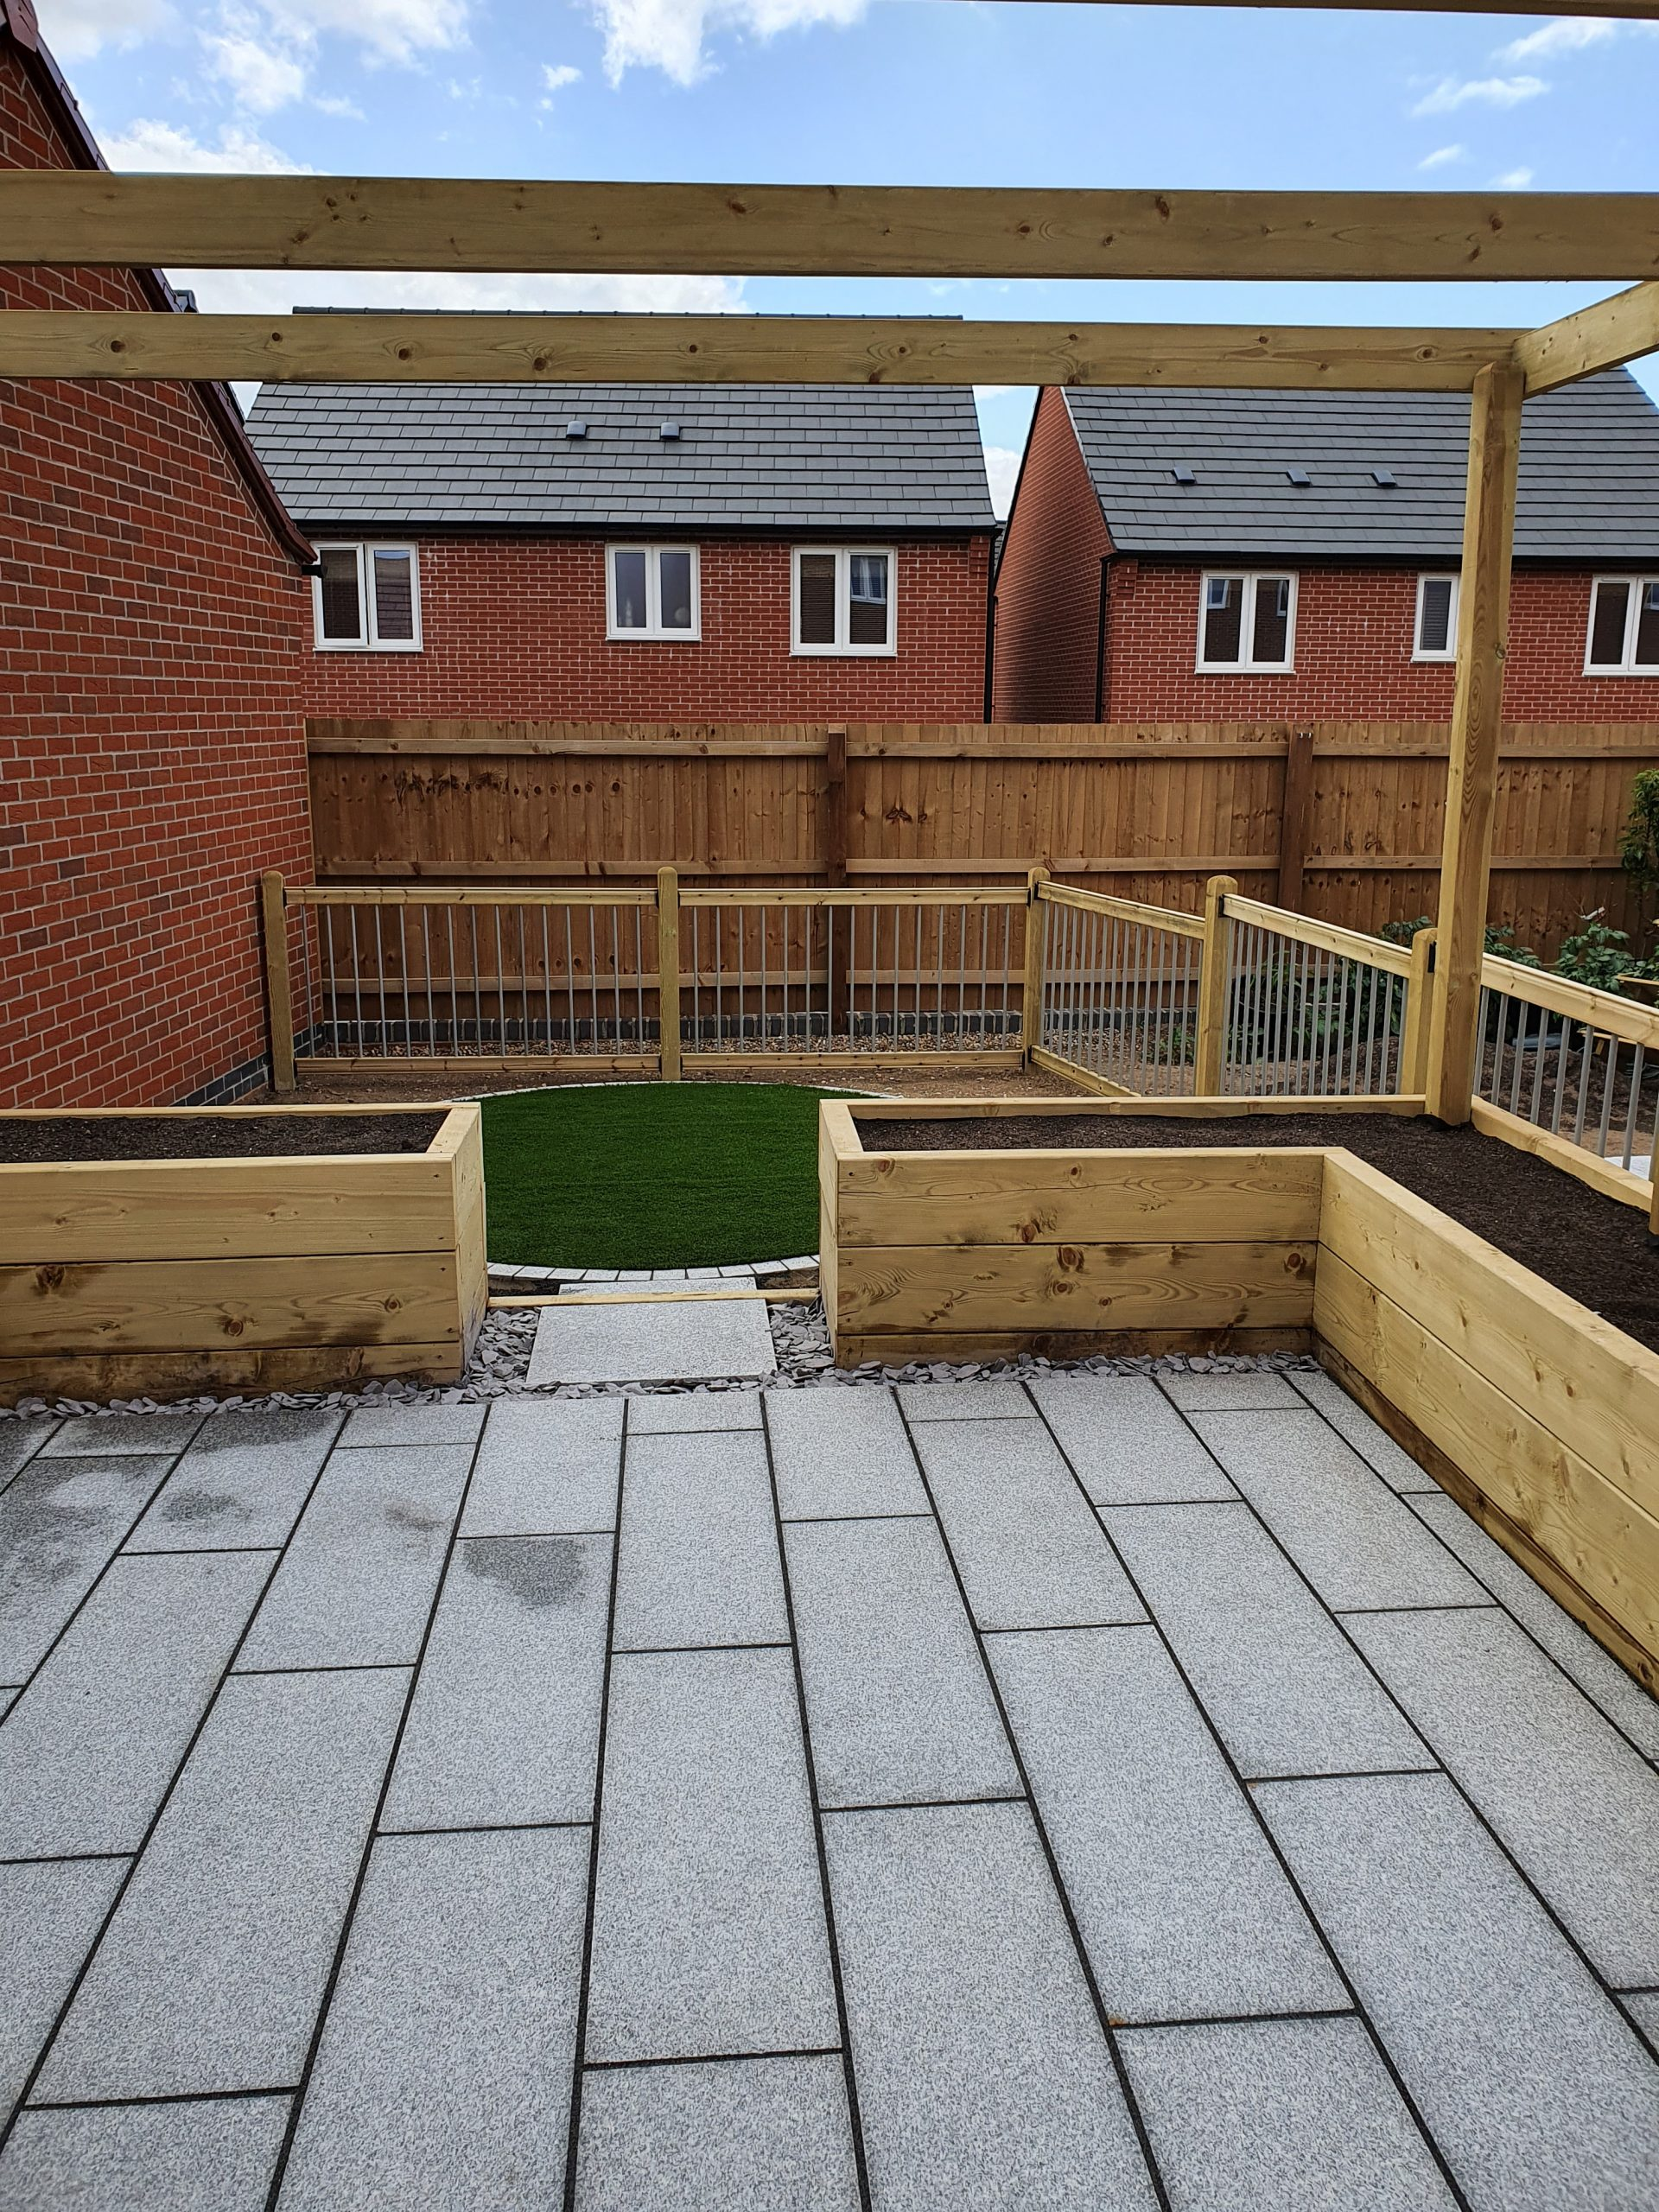 Wooden timber pergola, sleeper raised planters, railings and grey patio area